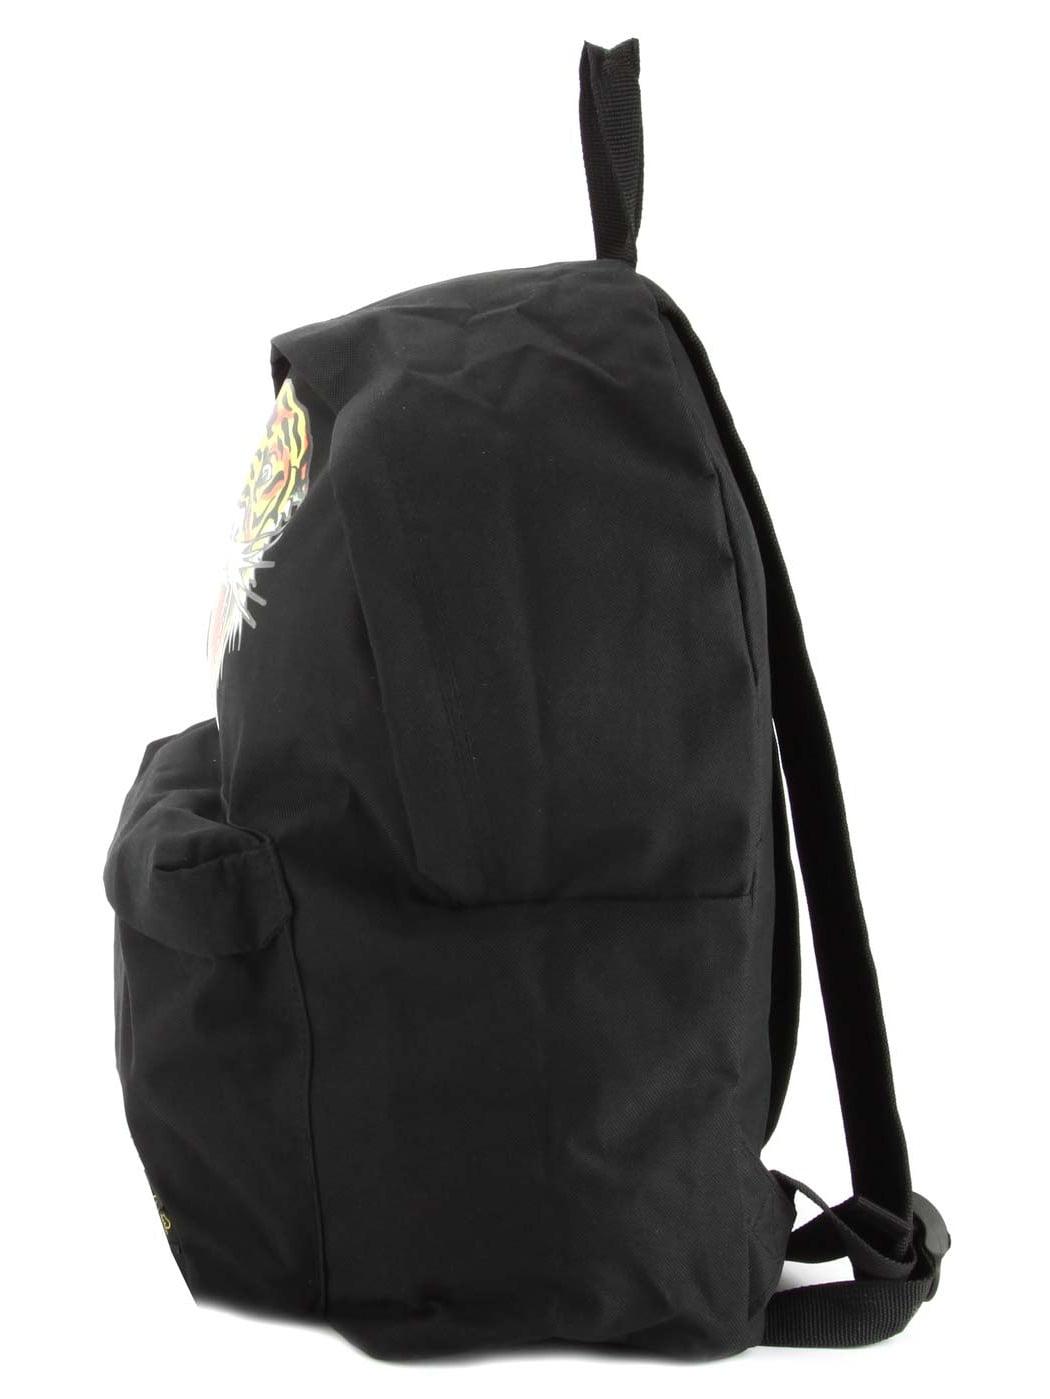 7224f991ef Ed Hardy - Shane Tiger Backpack-Black - Walmart.com